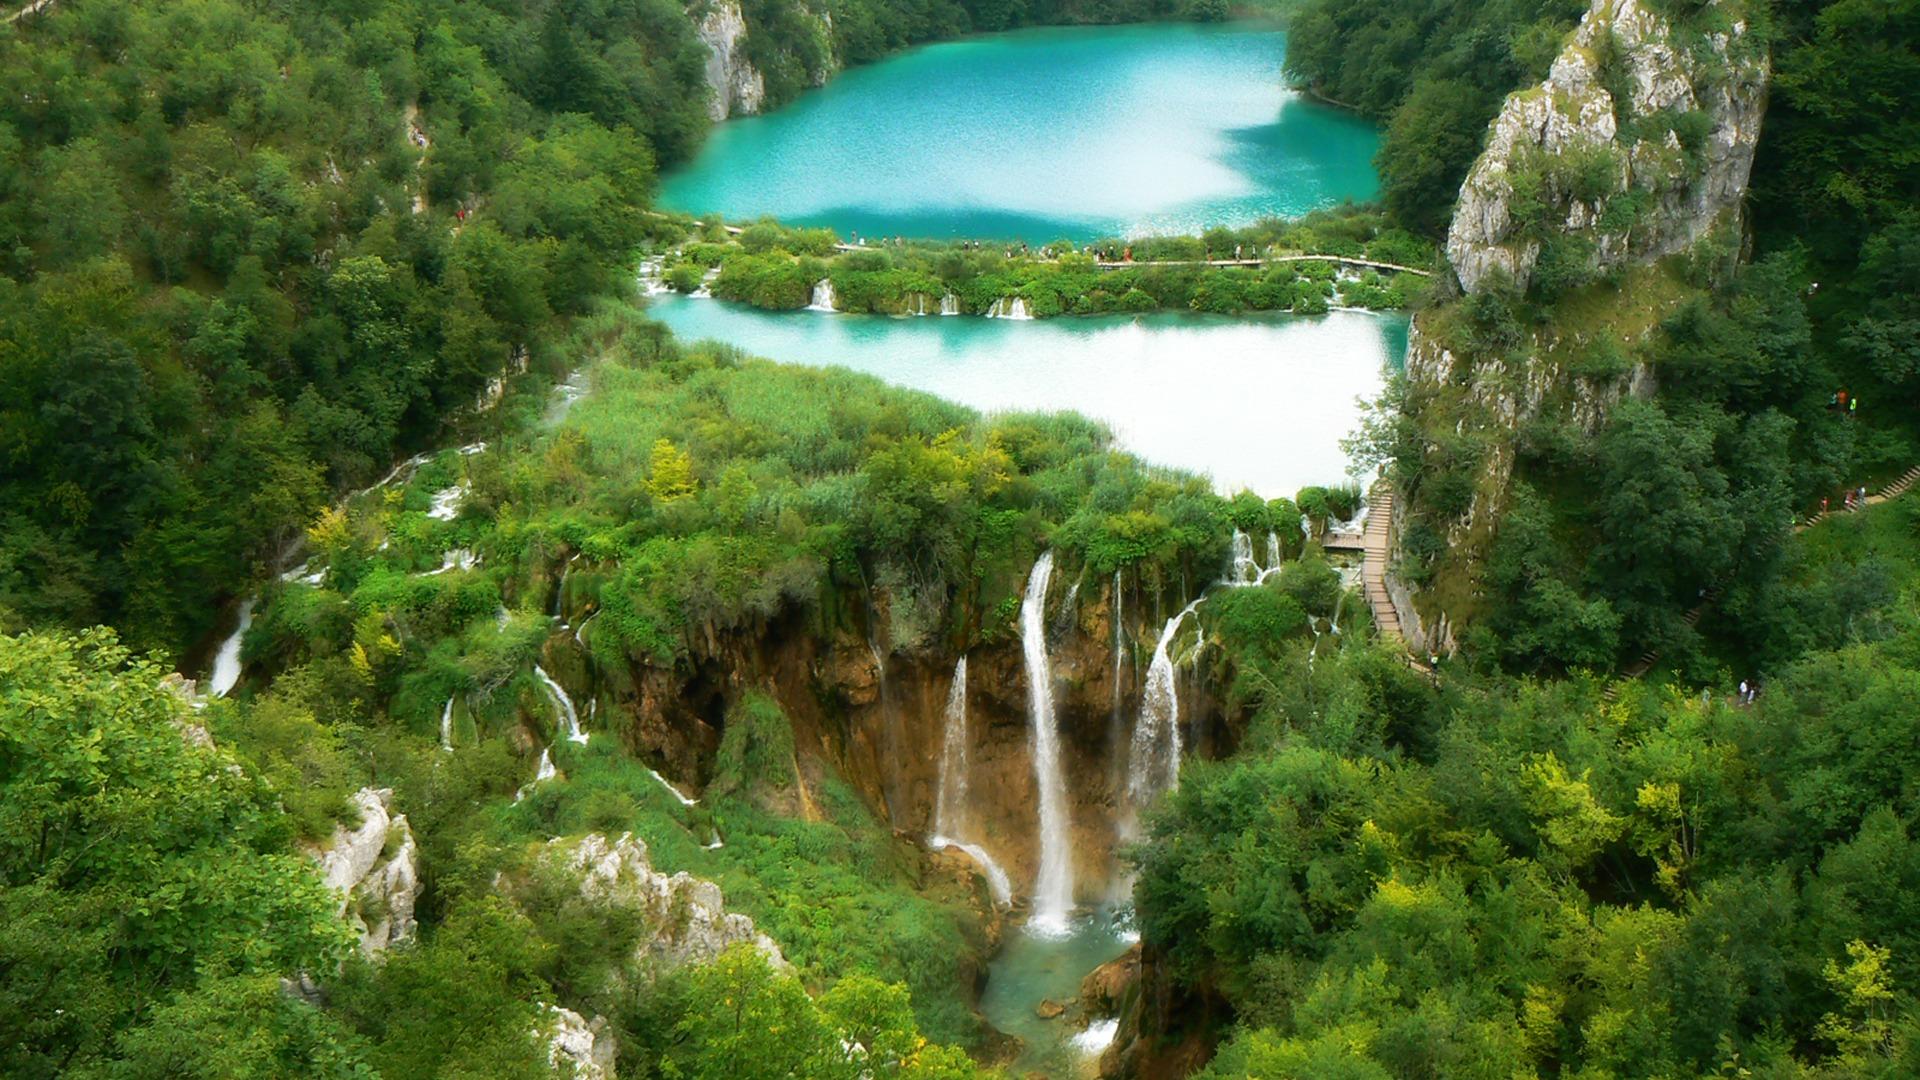 Wallpaper download pagalworld - Plitvice Waterfalls Wallpaper Croatia World